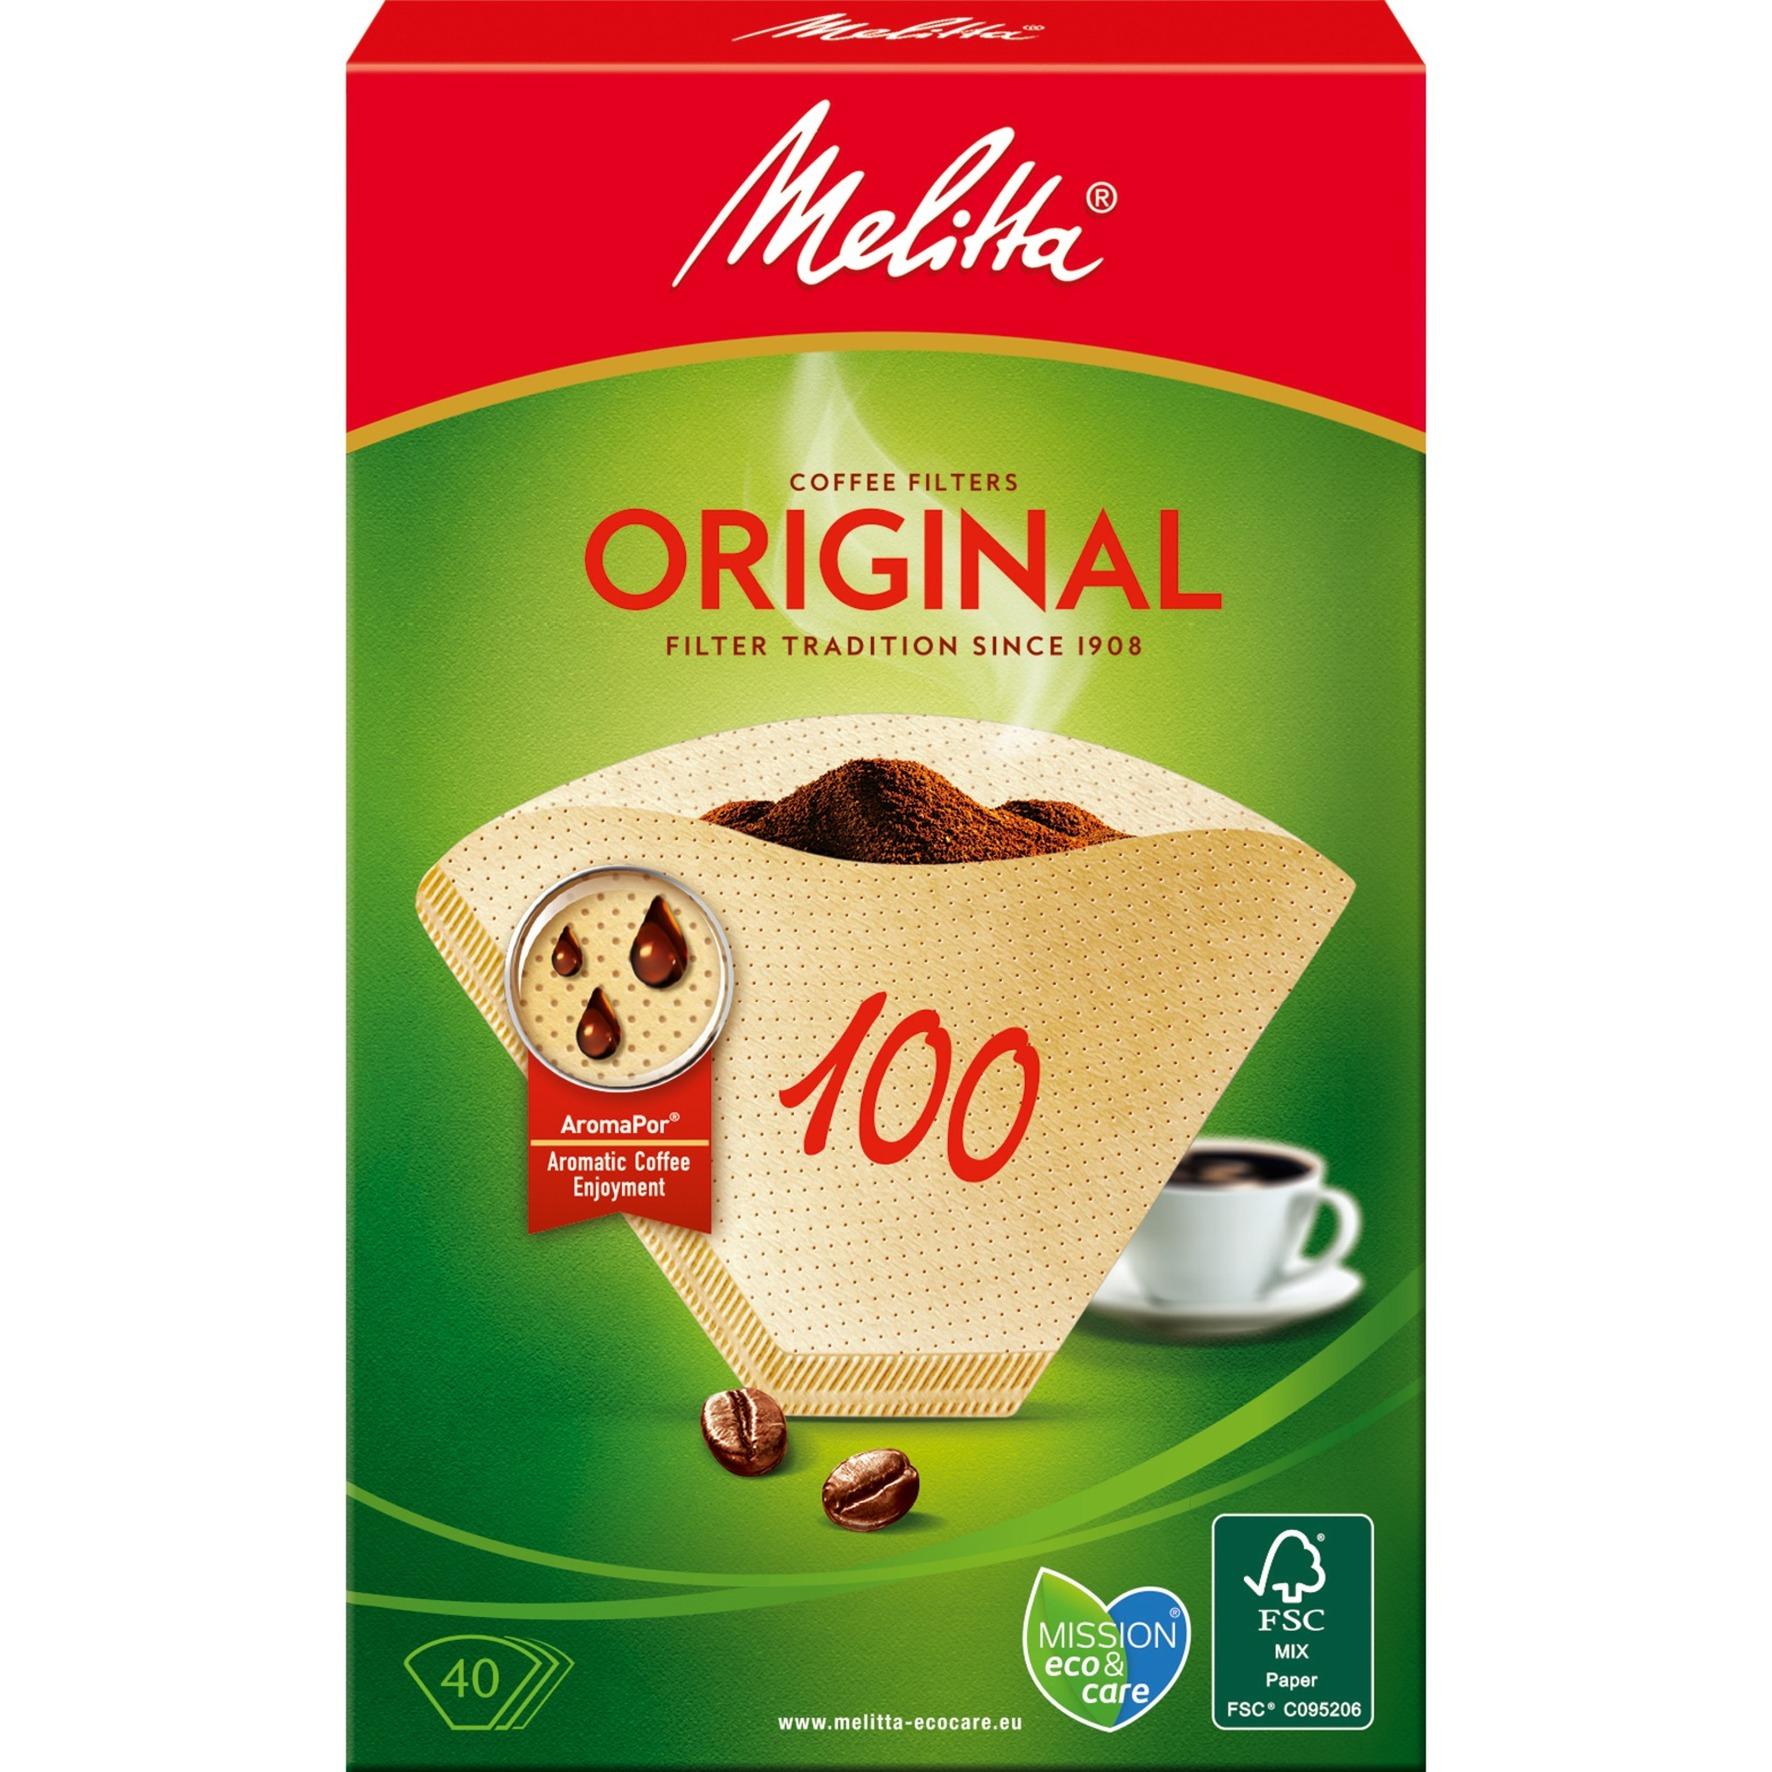 12603.3 filtro de café Filtro de café desechable Marrón 40 pieza(s), Filtros de café